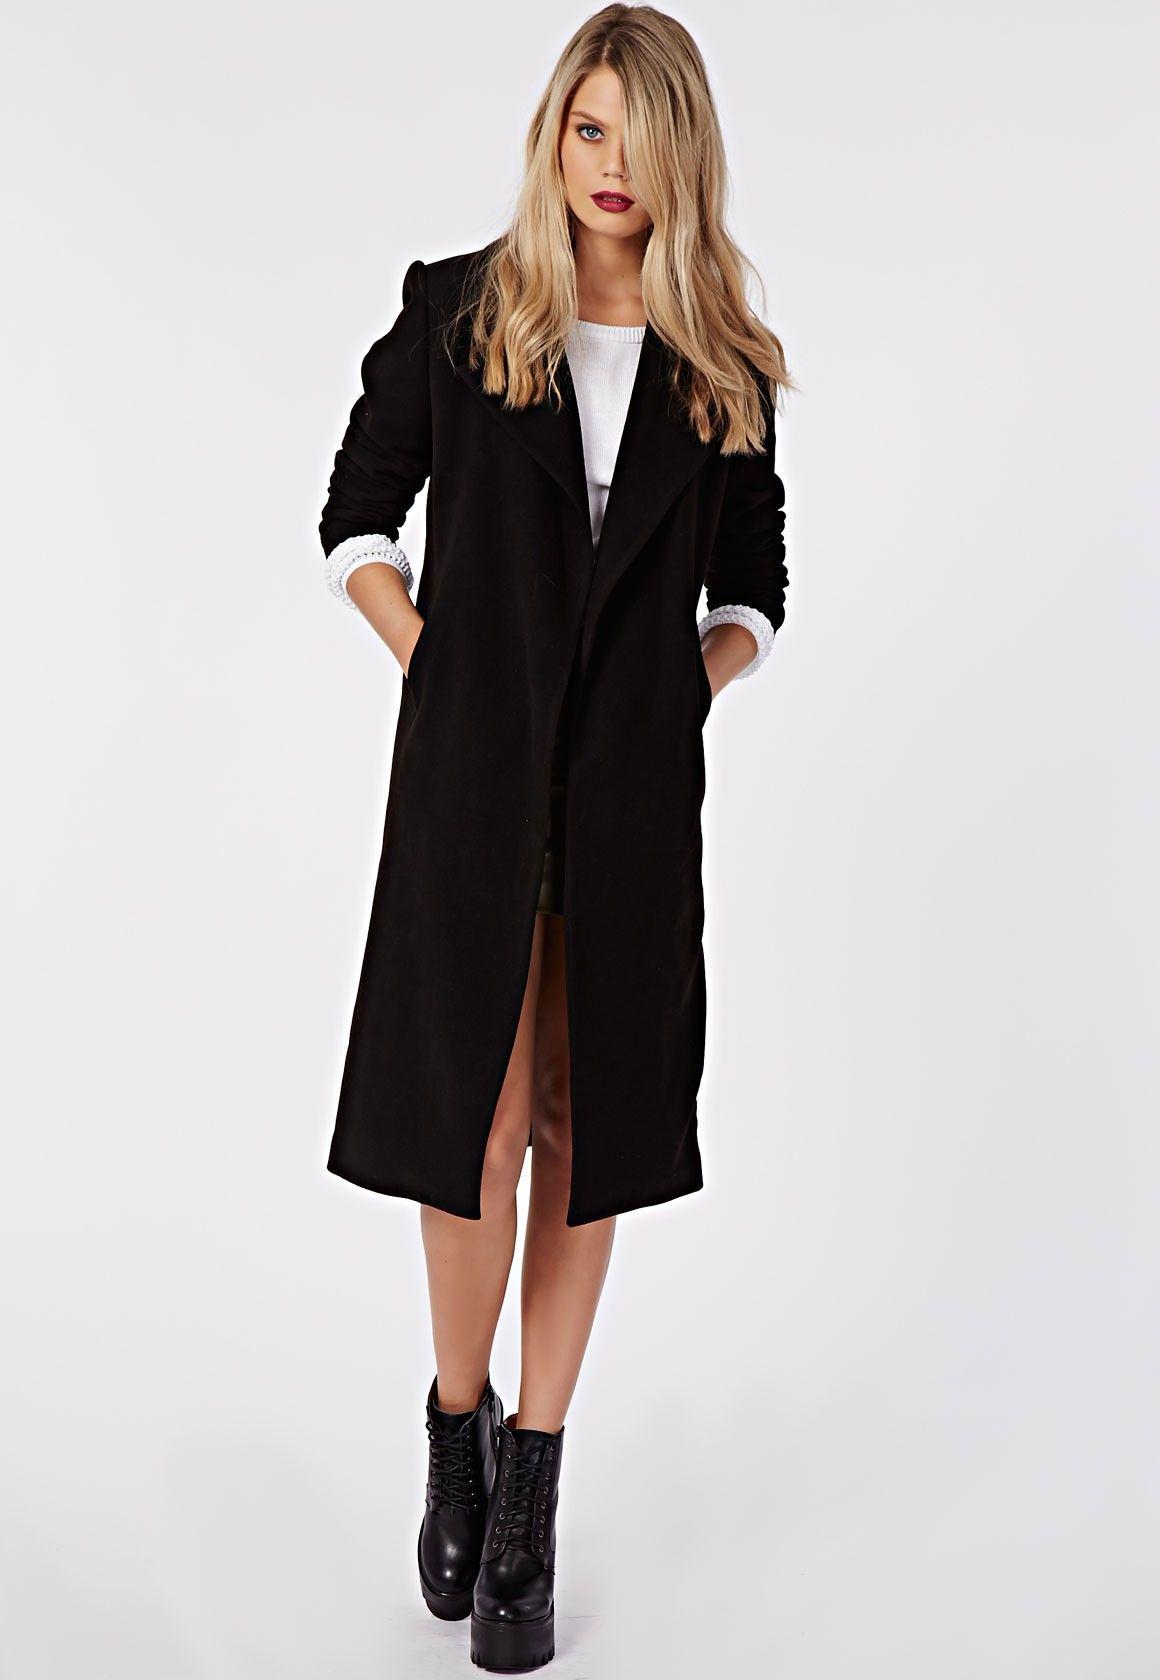 www.fashionmyloveitaly.com Khloe Premium Waterfall Coat Black ...